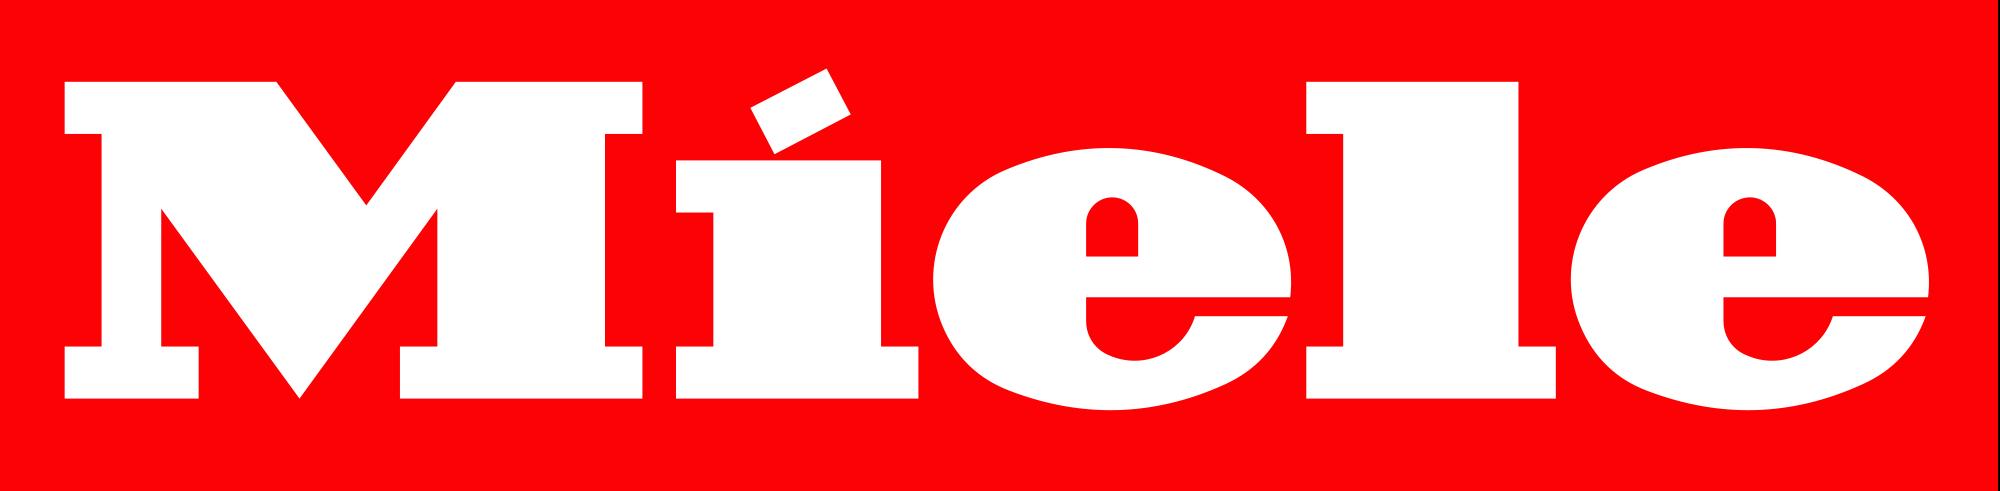 miele-emblem